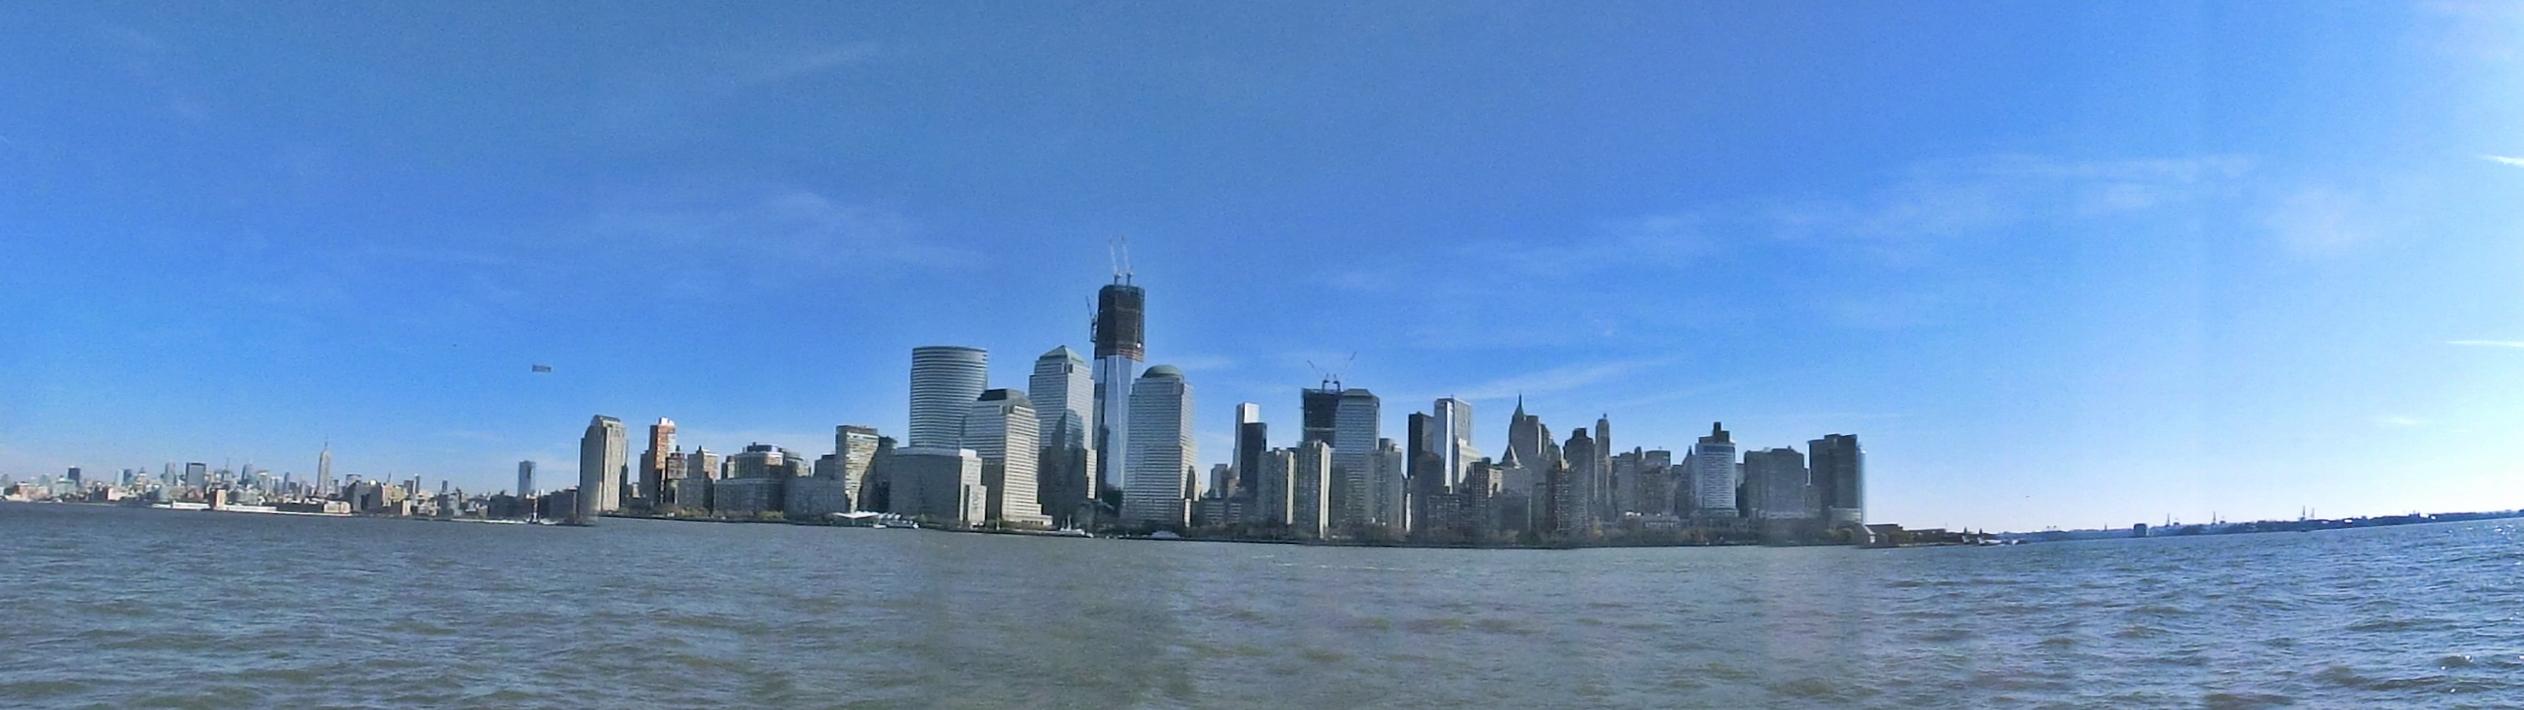 New York 021.jpg